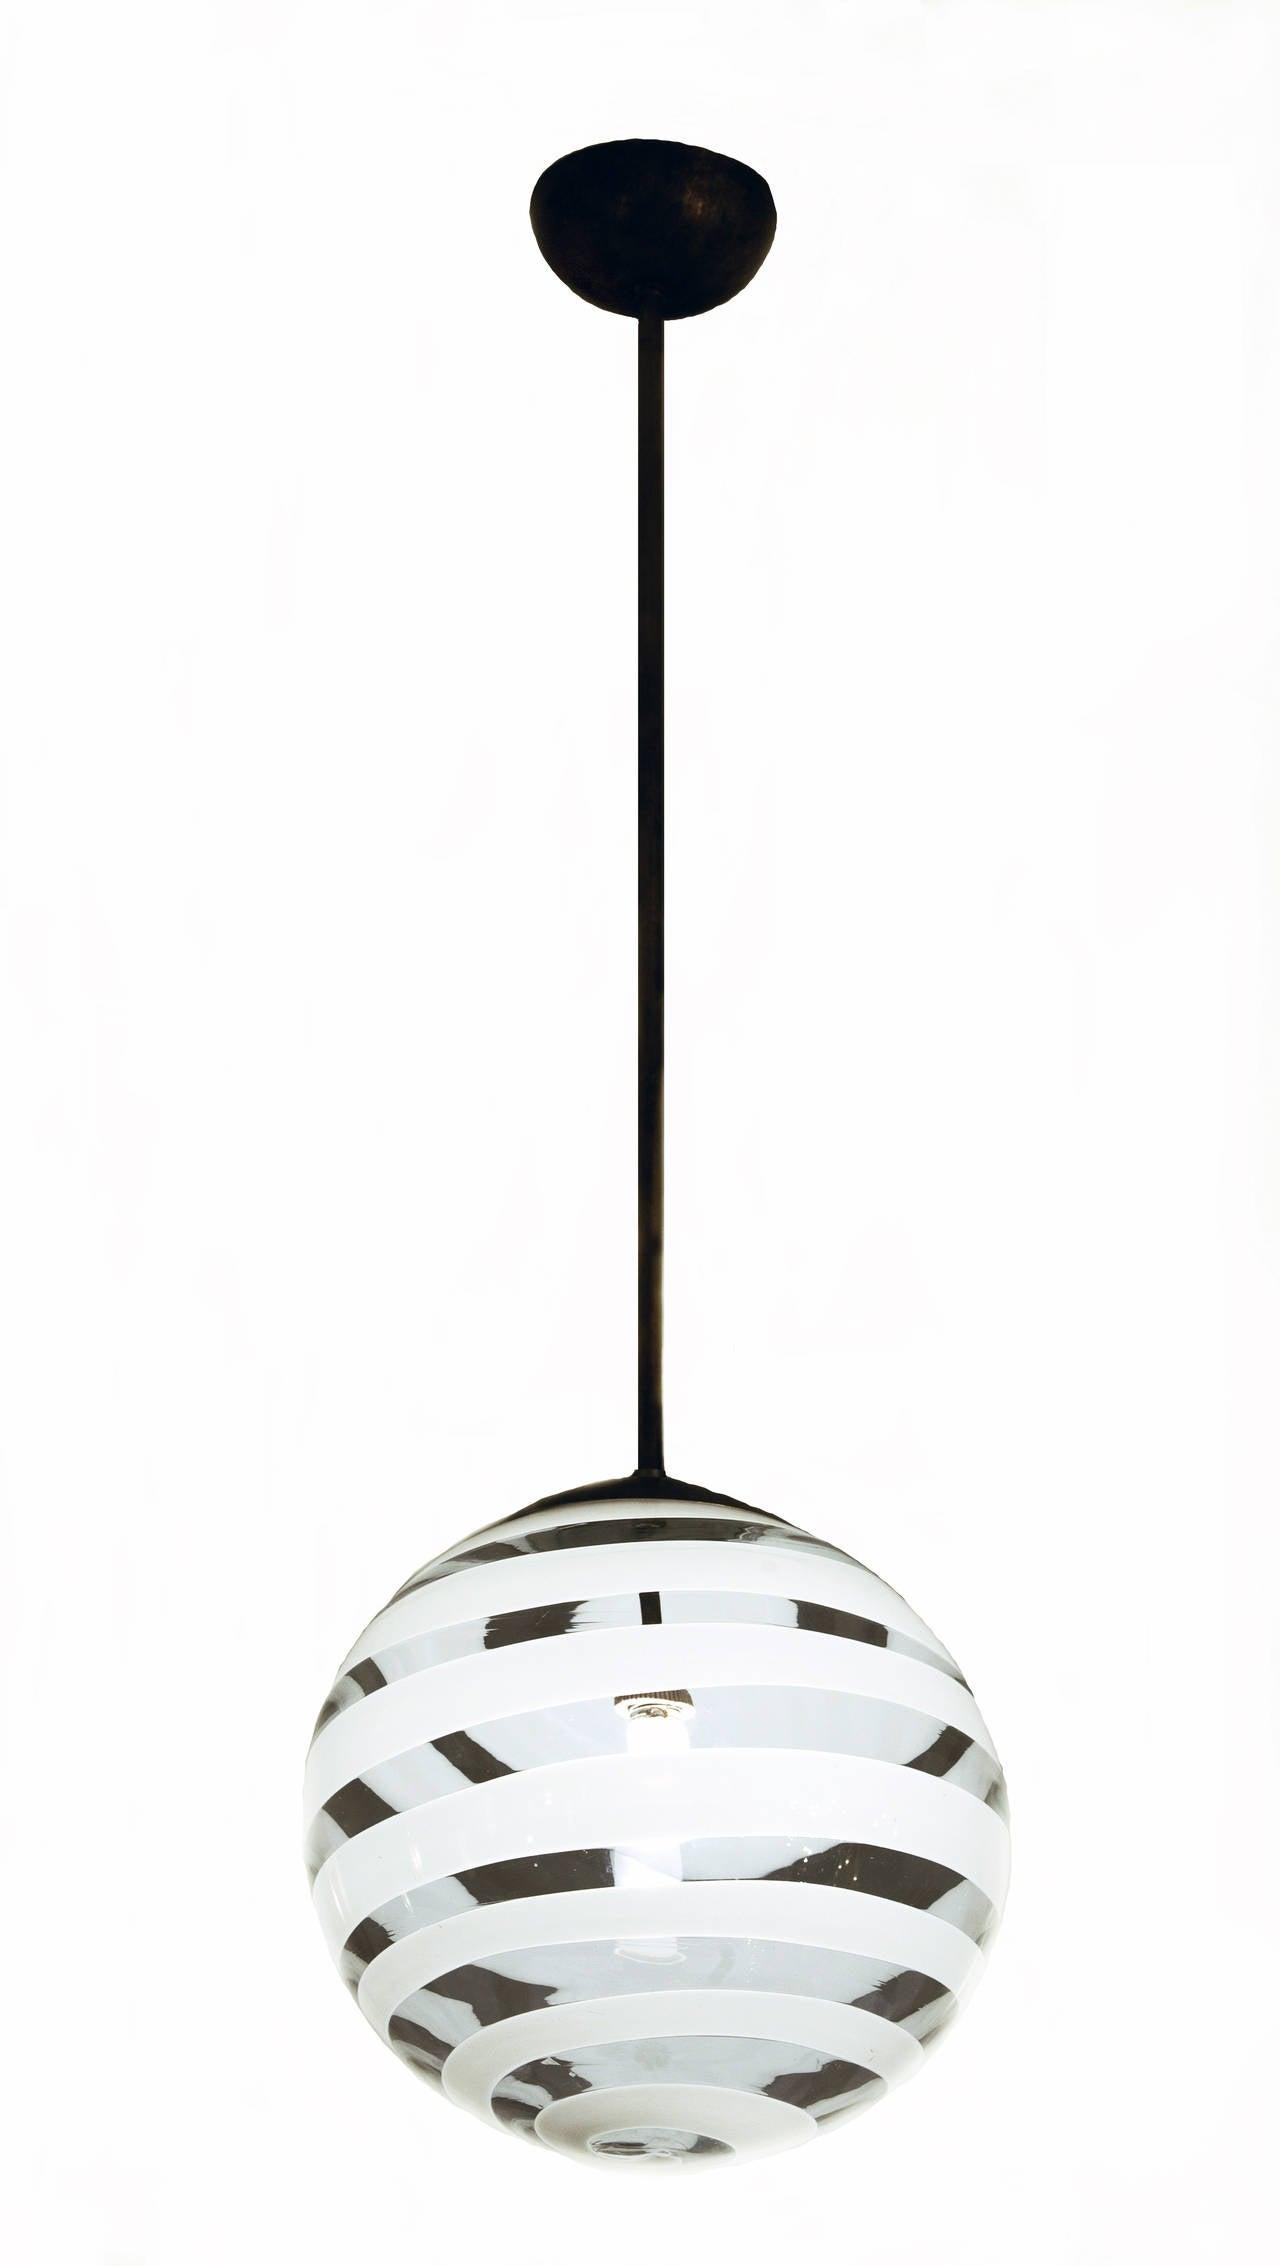 "Carlo Scarpa ceiling lamp 1938   Ceiling lamp designed by Carlo Scarpa and manufactured by Venini Murano  Clear and Lattimo "" a fasce"" glass exhecuted by Venini Murano   Measures: h 100cm x 32 cm (diam.) Literature: Anna Venini Diaz De"